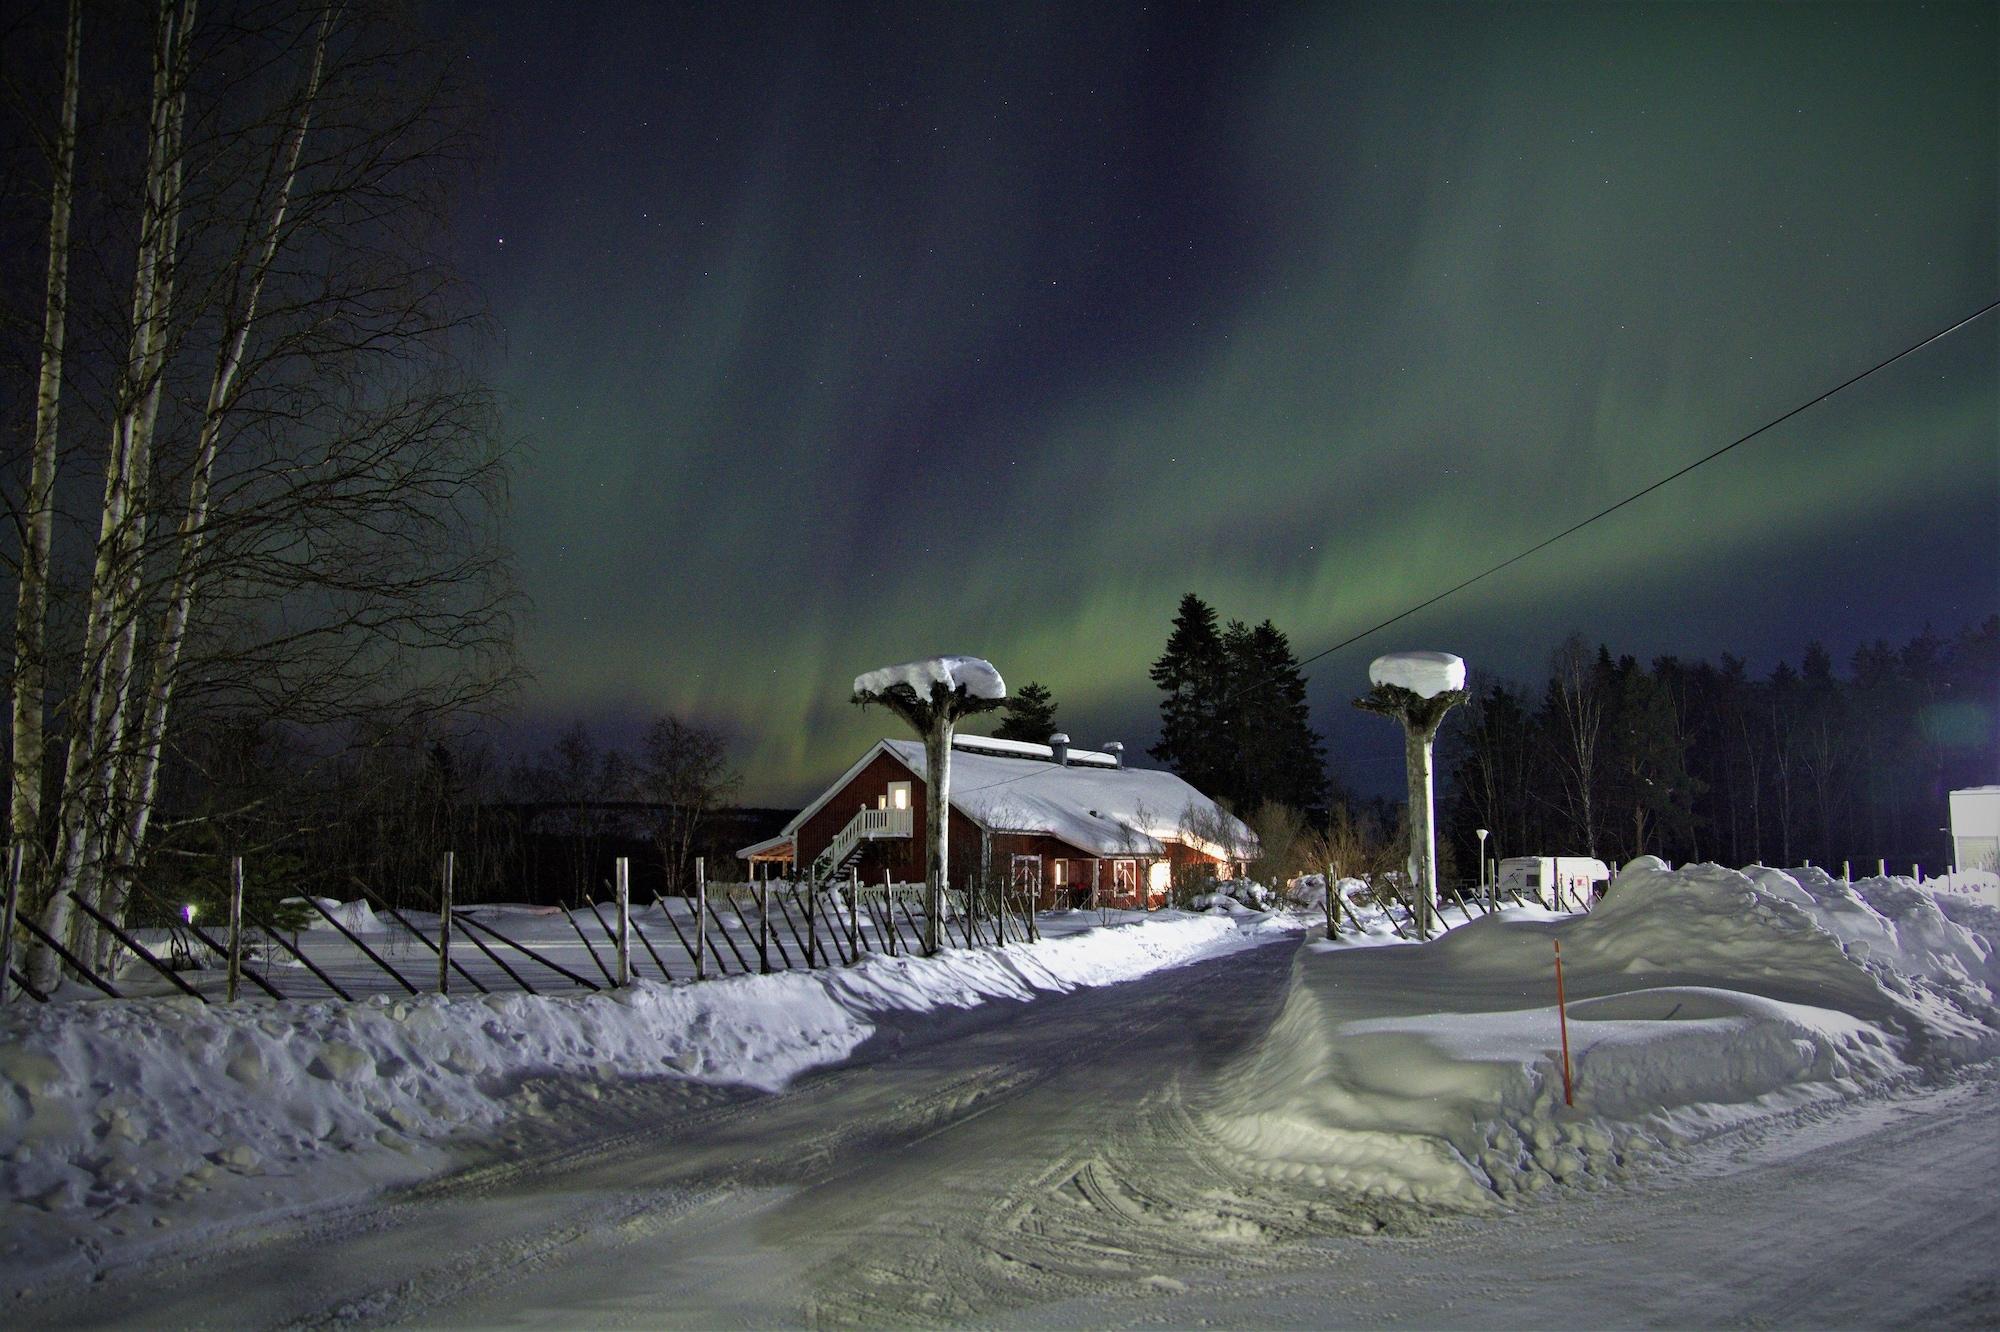 Wanha Autti Camping Rovaniemi, Lapland